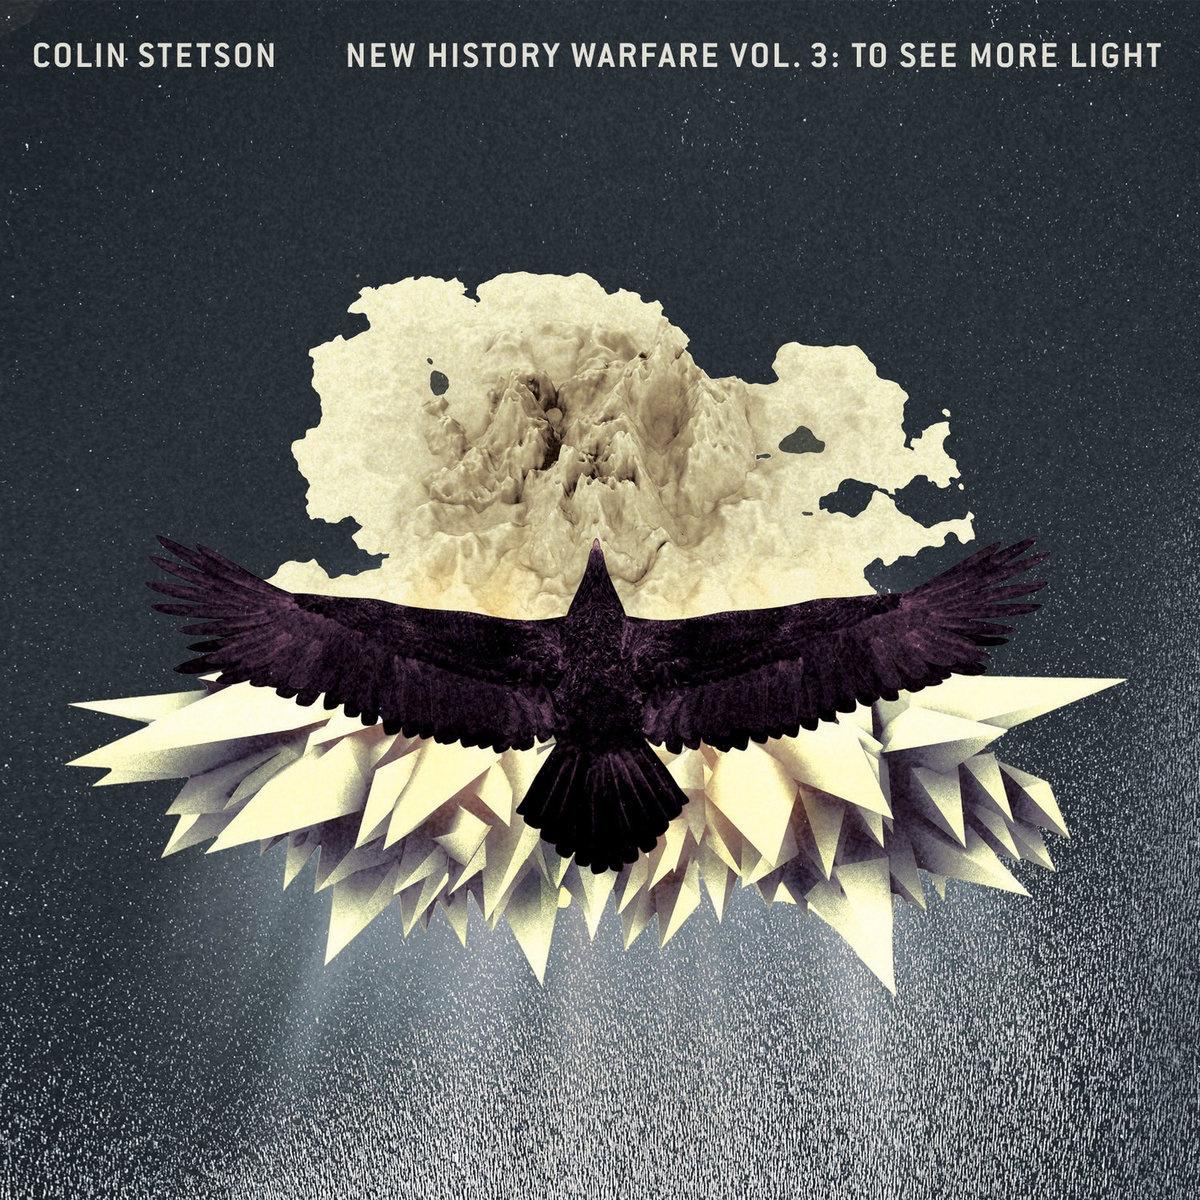 Colin Stetson • New History Warfare Vol. 3 : To See More Light-1